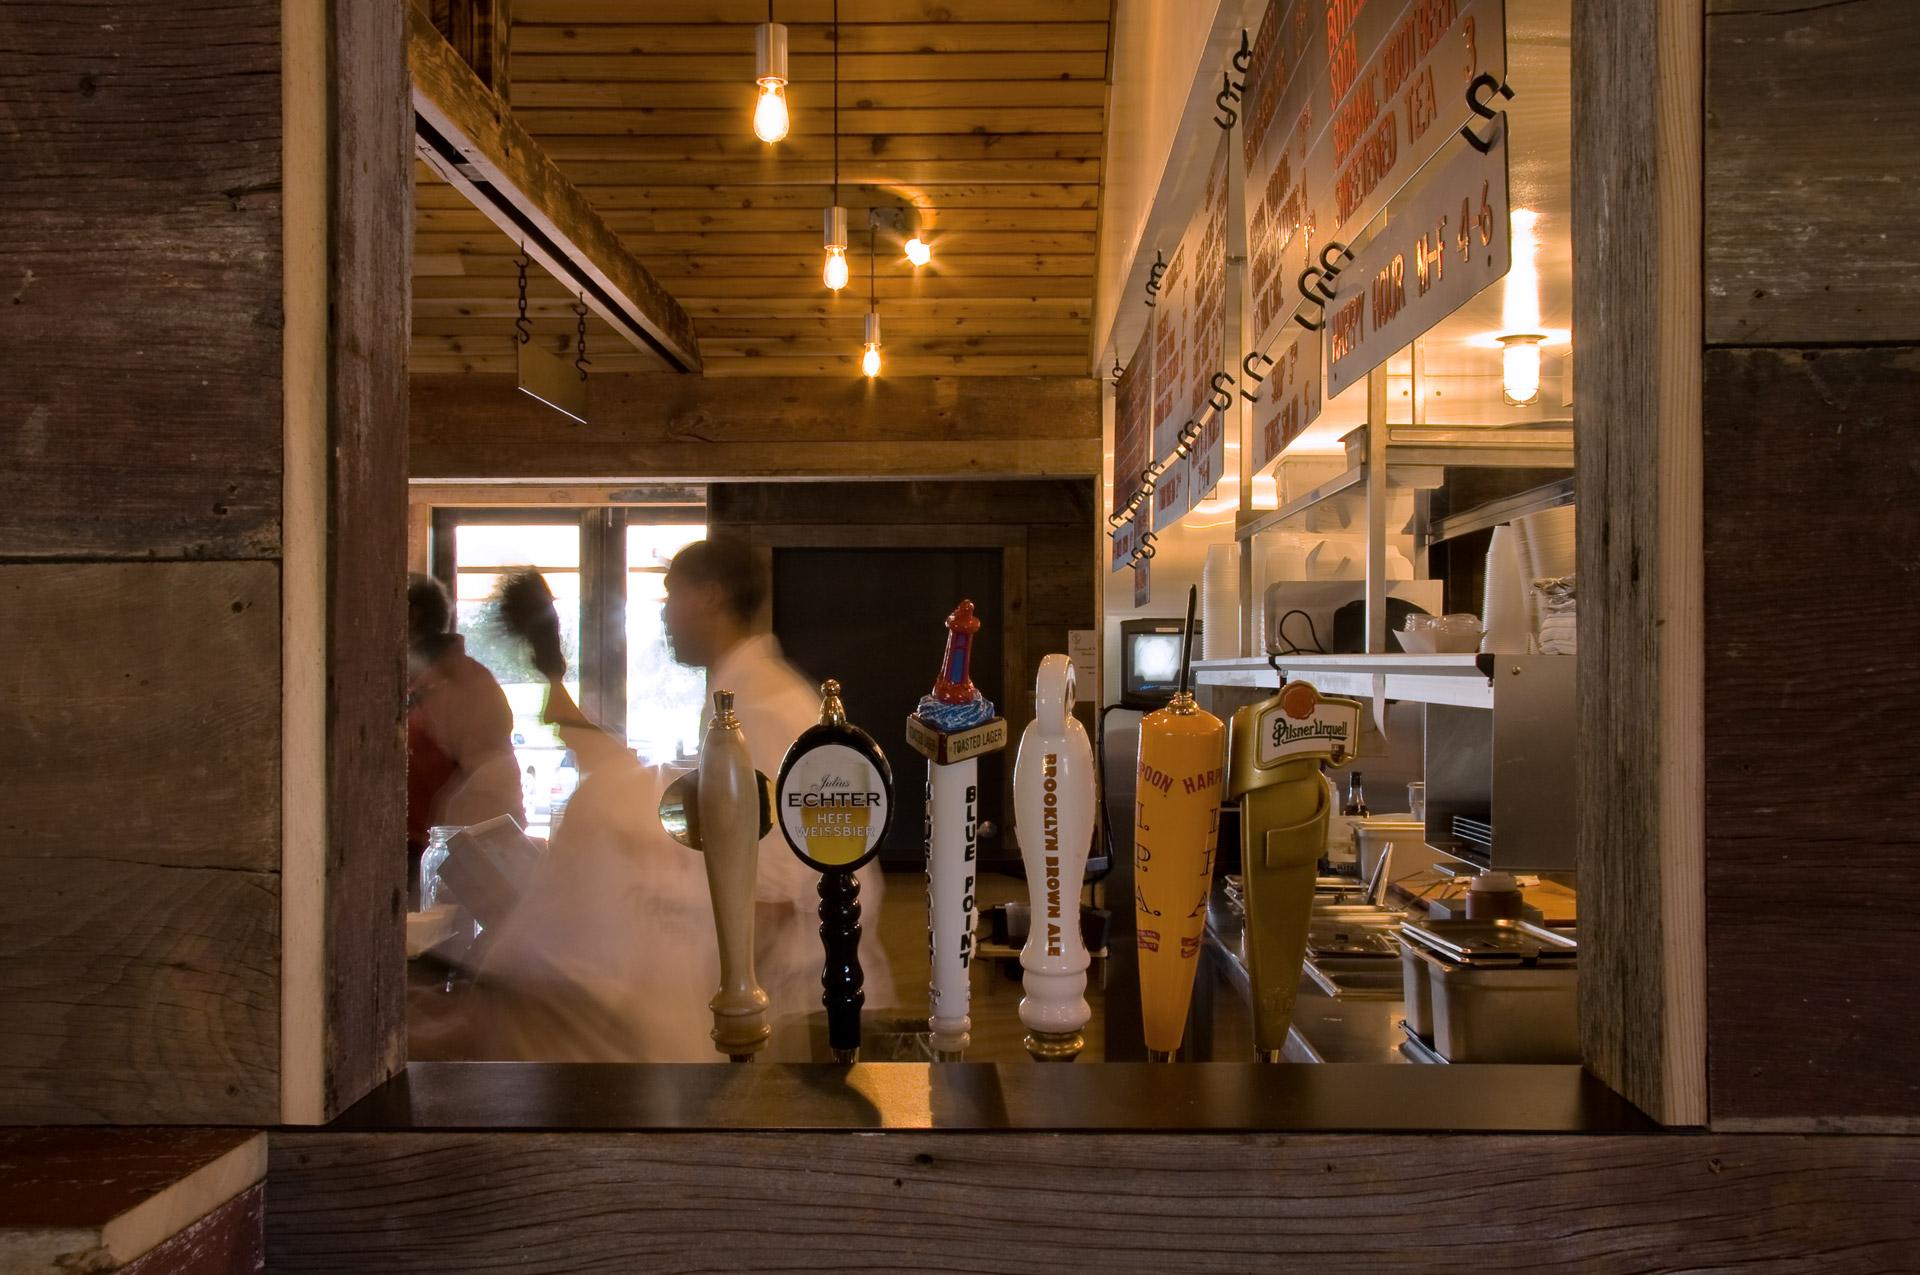 Townline BBQ restaurant interiors